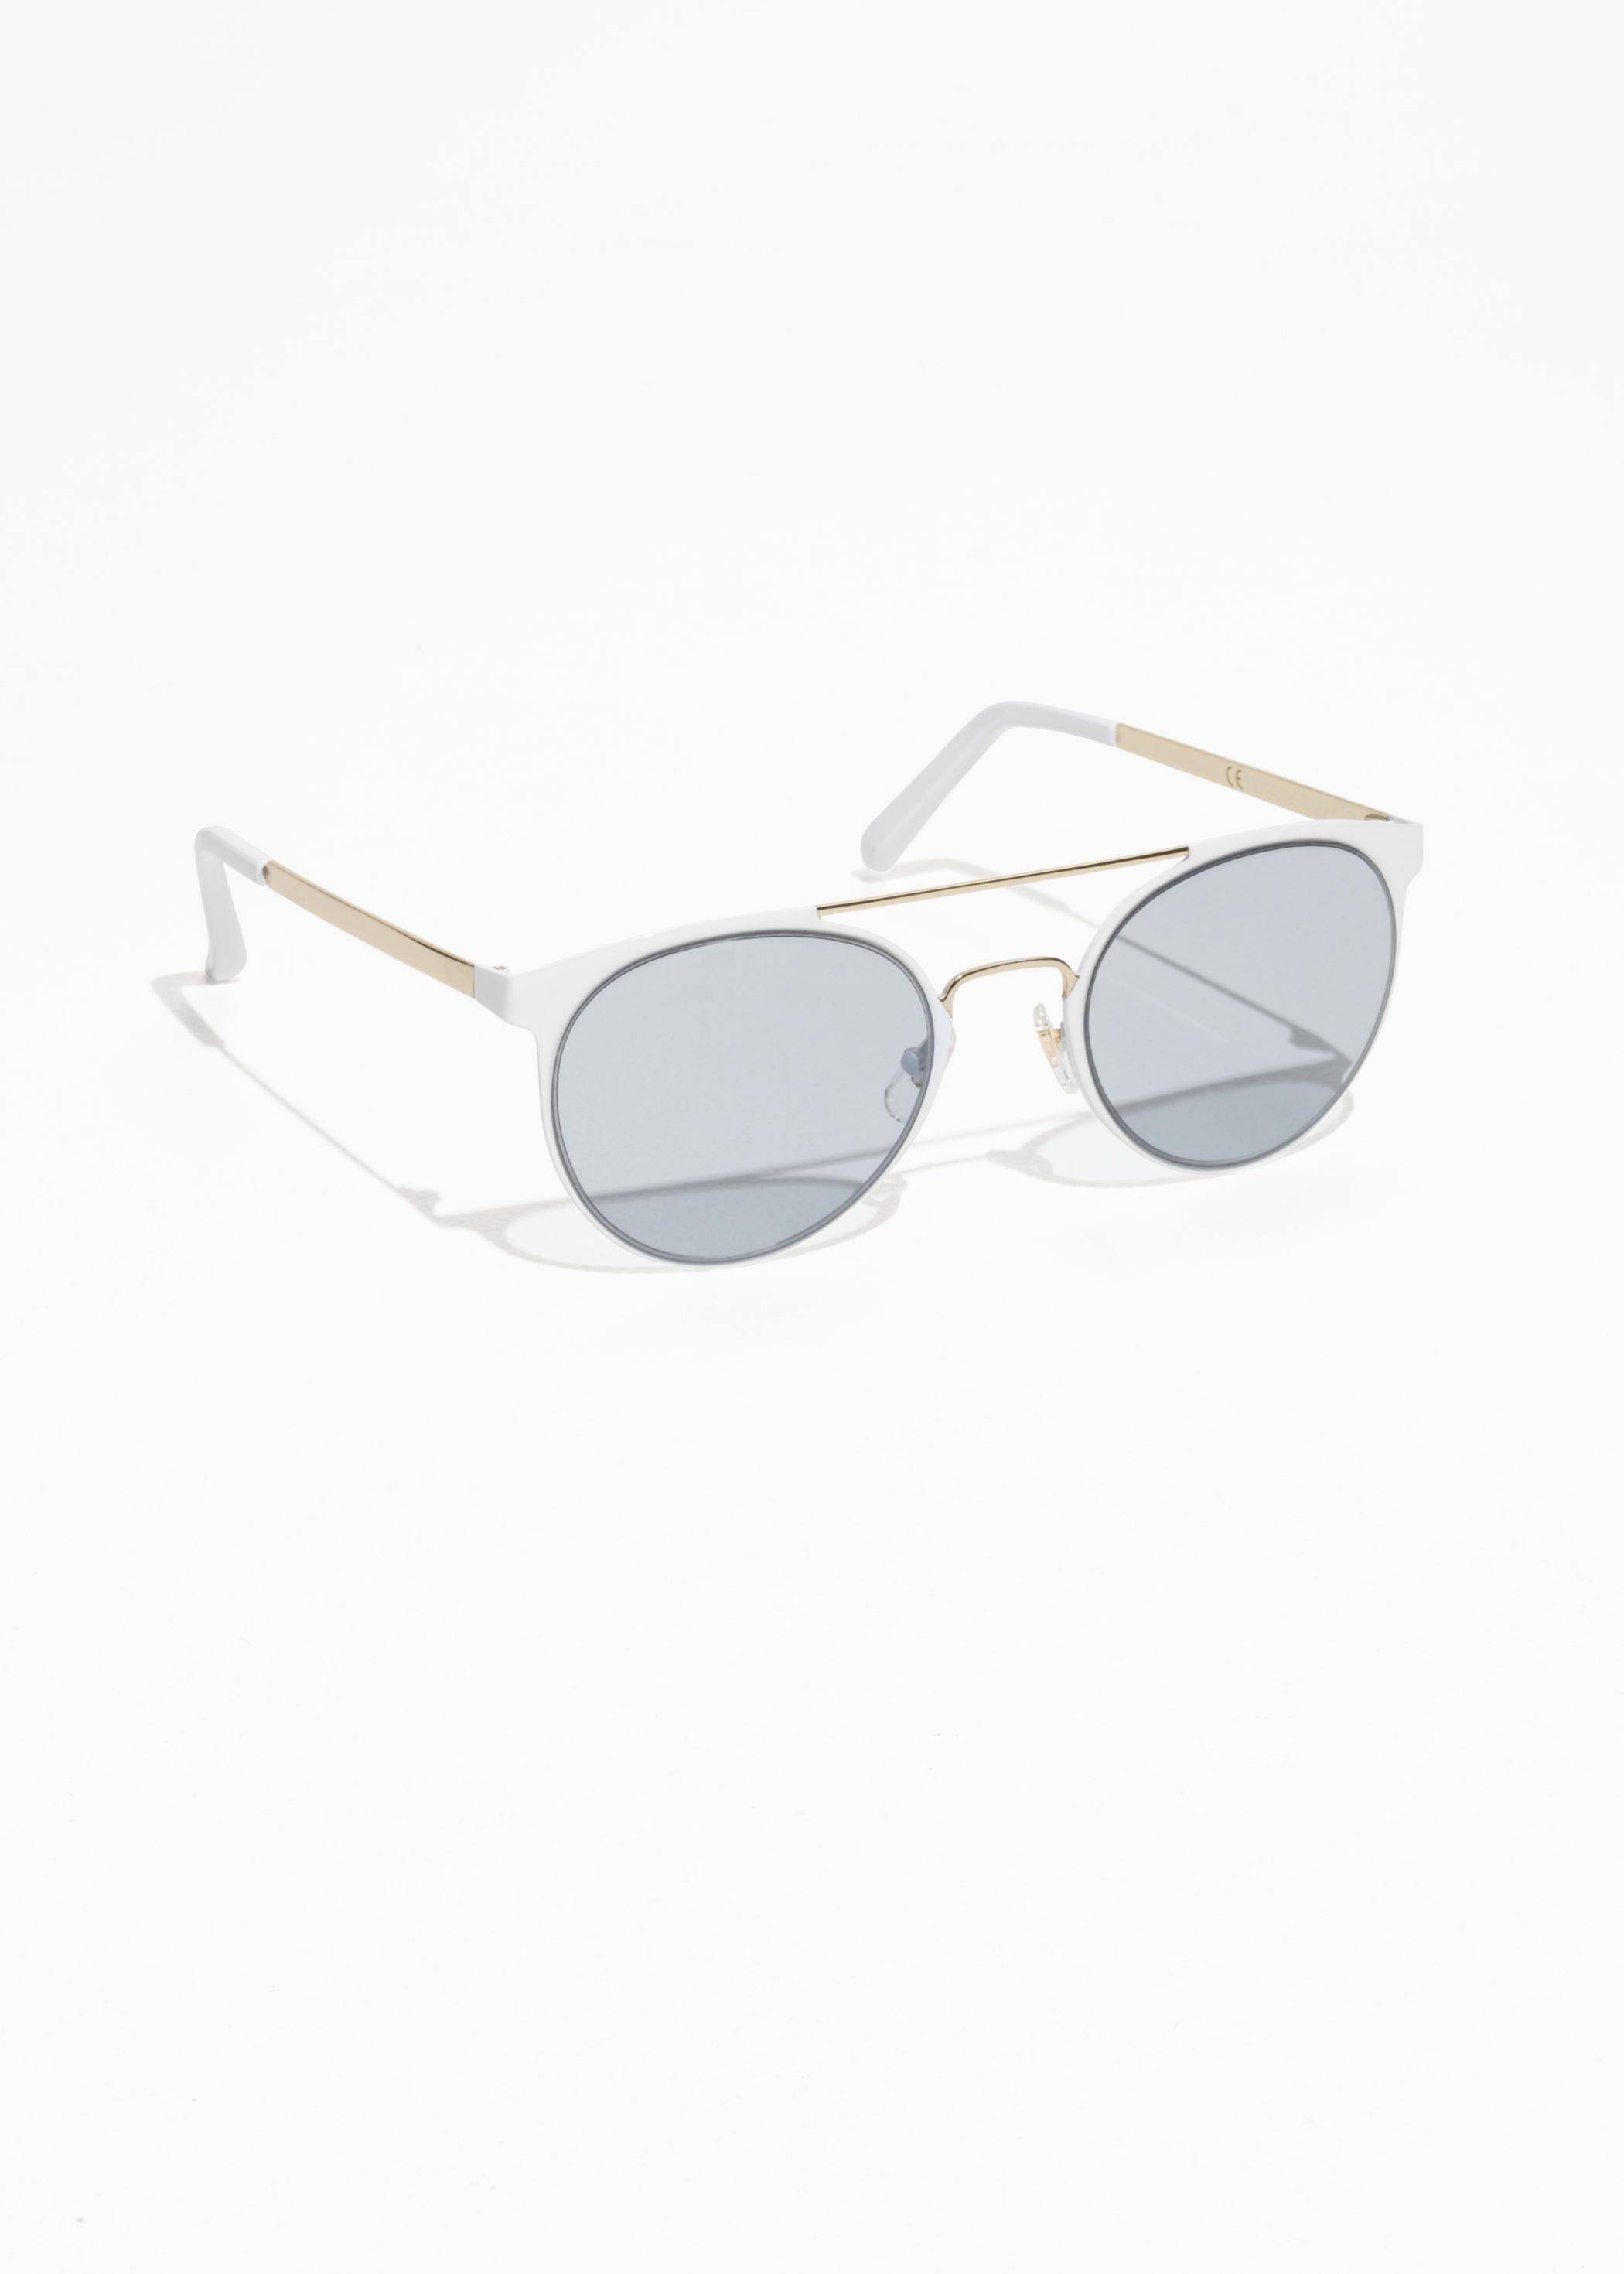 44350b8679a8 Cheap Sunglasses - Affordable Stylish